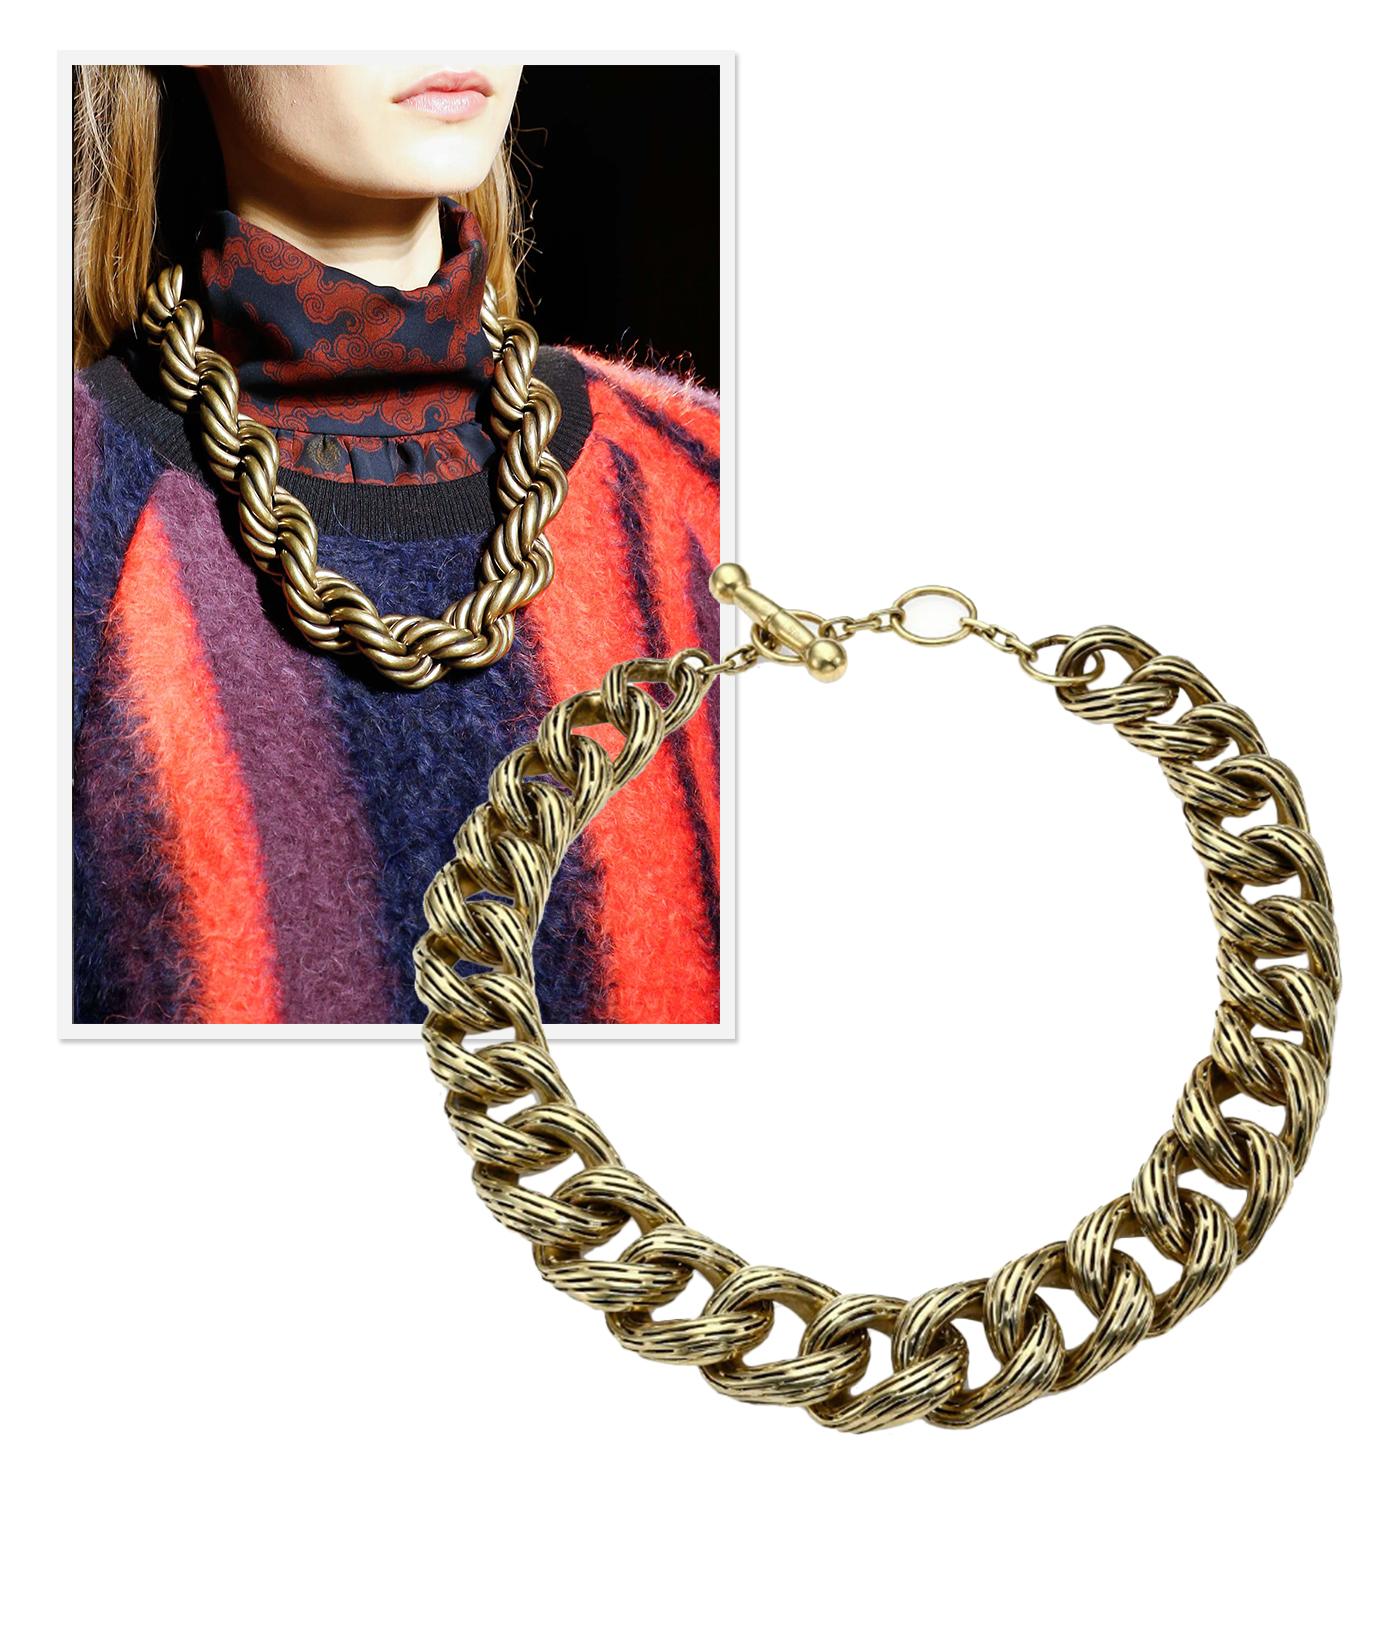 jewelry-trends-fall-2015-runway-04.jpg